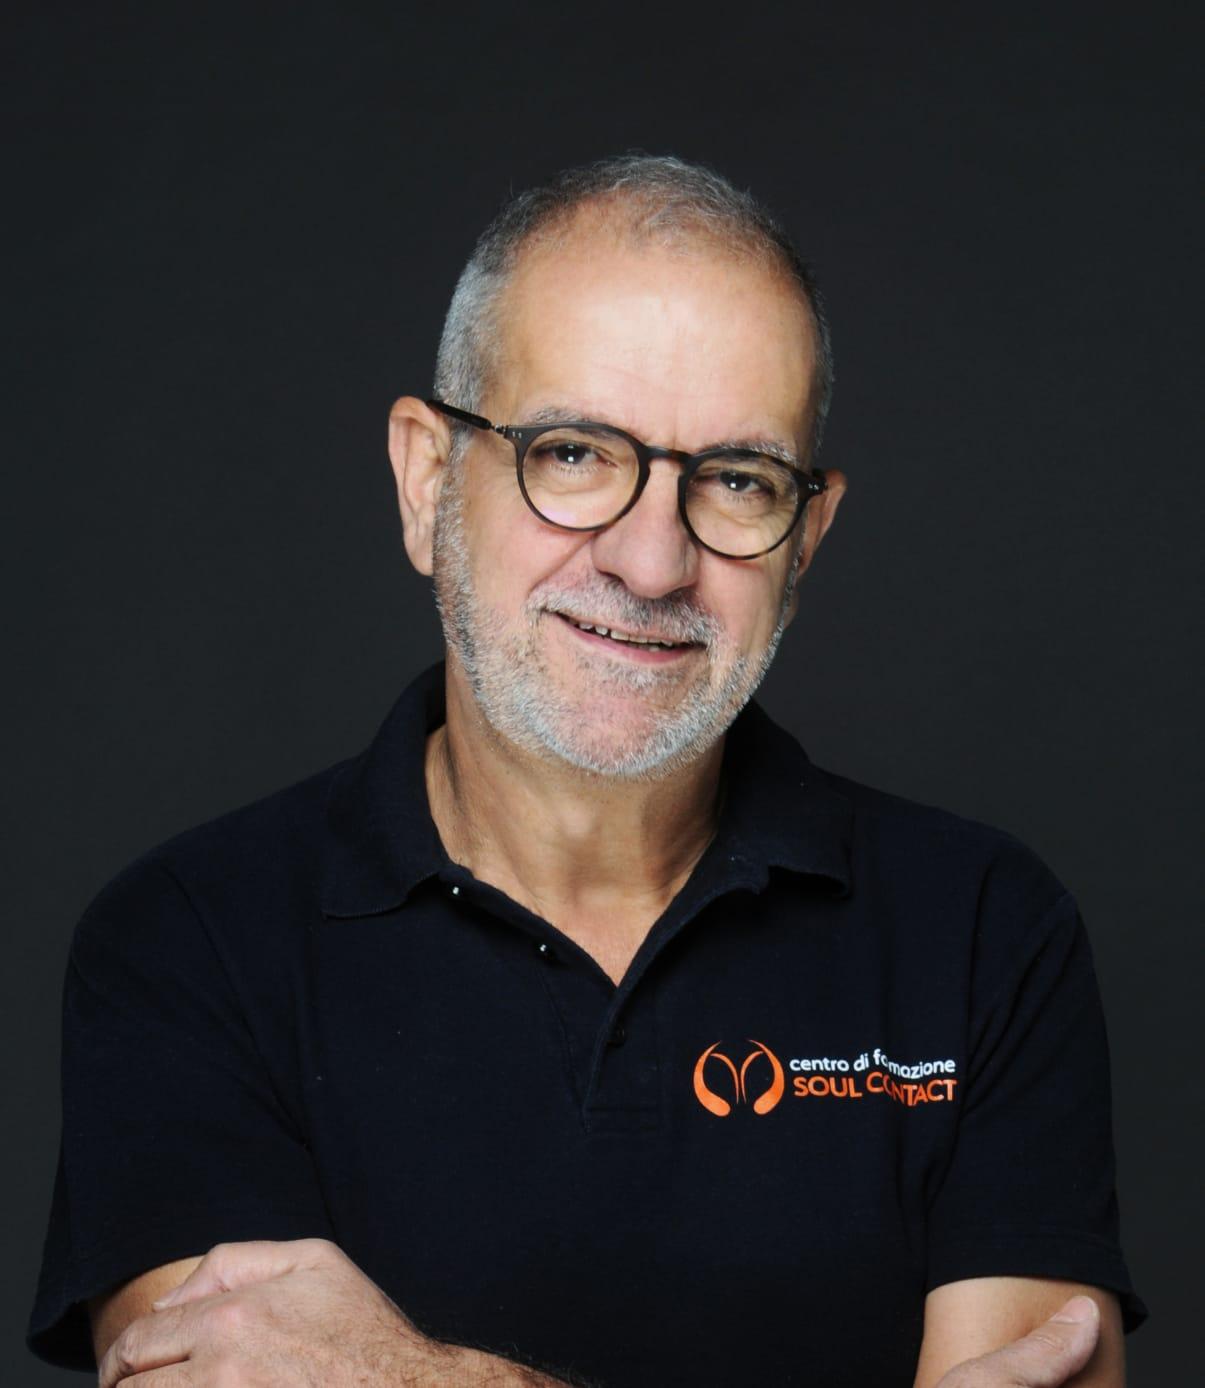 Gabriele Masala nuova